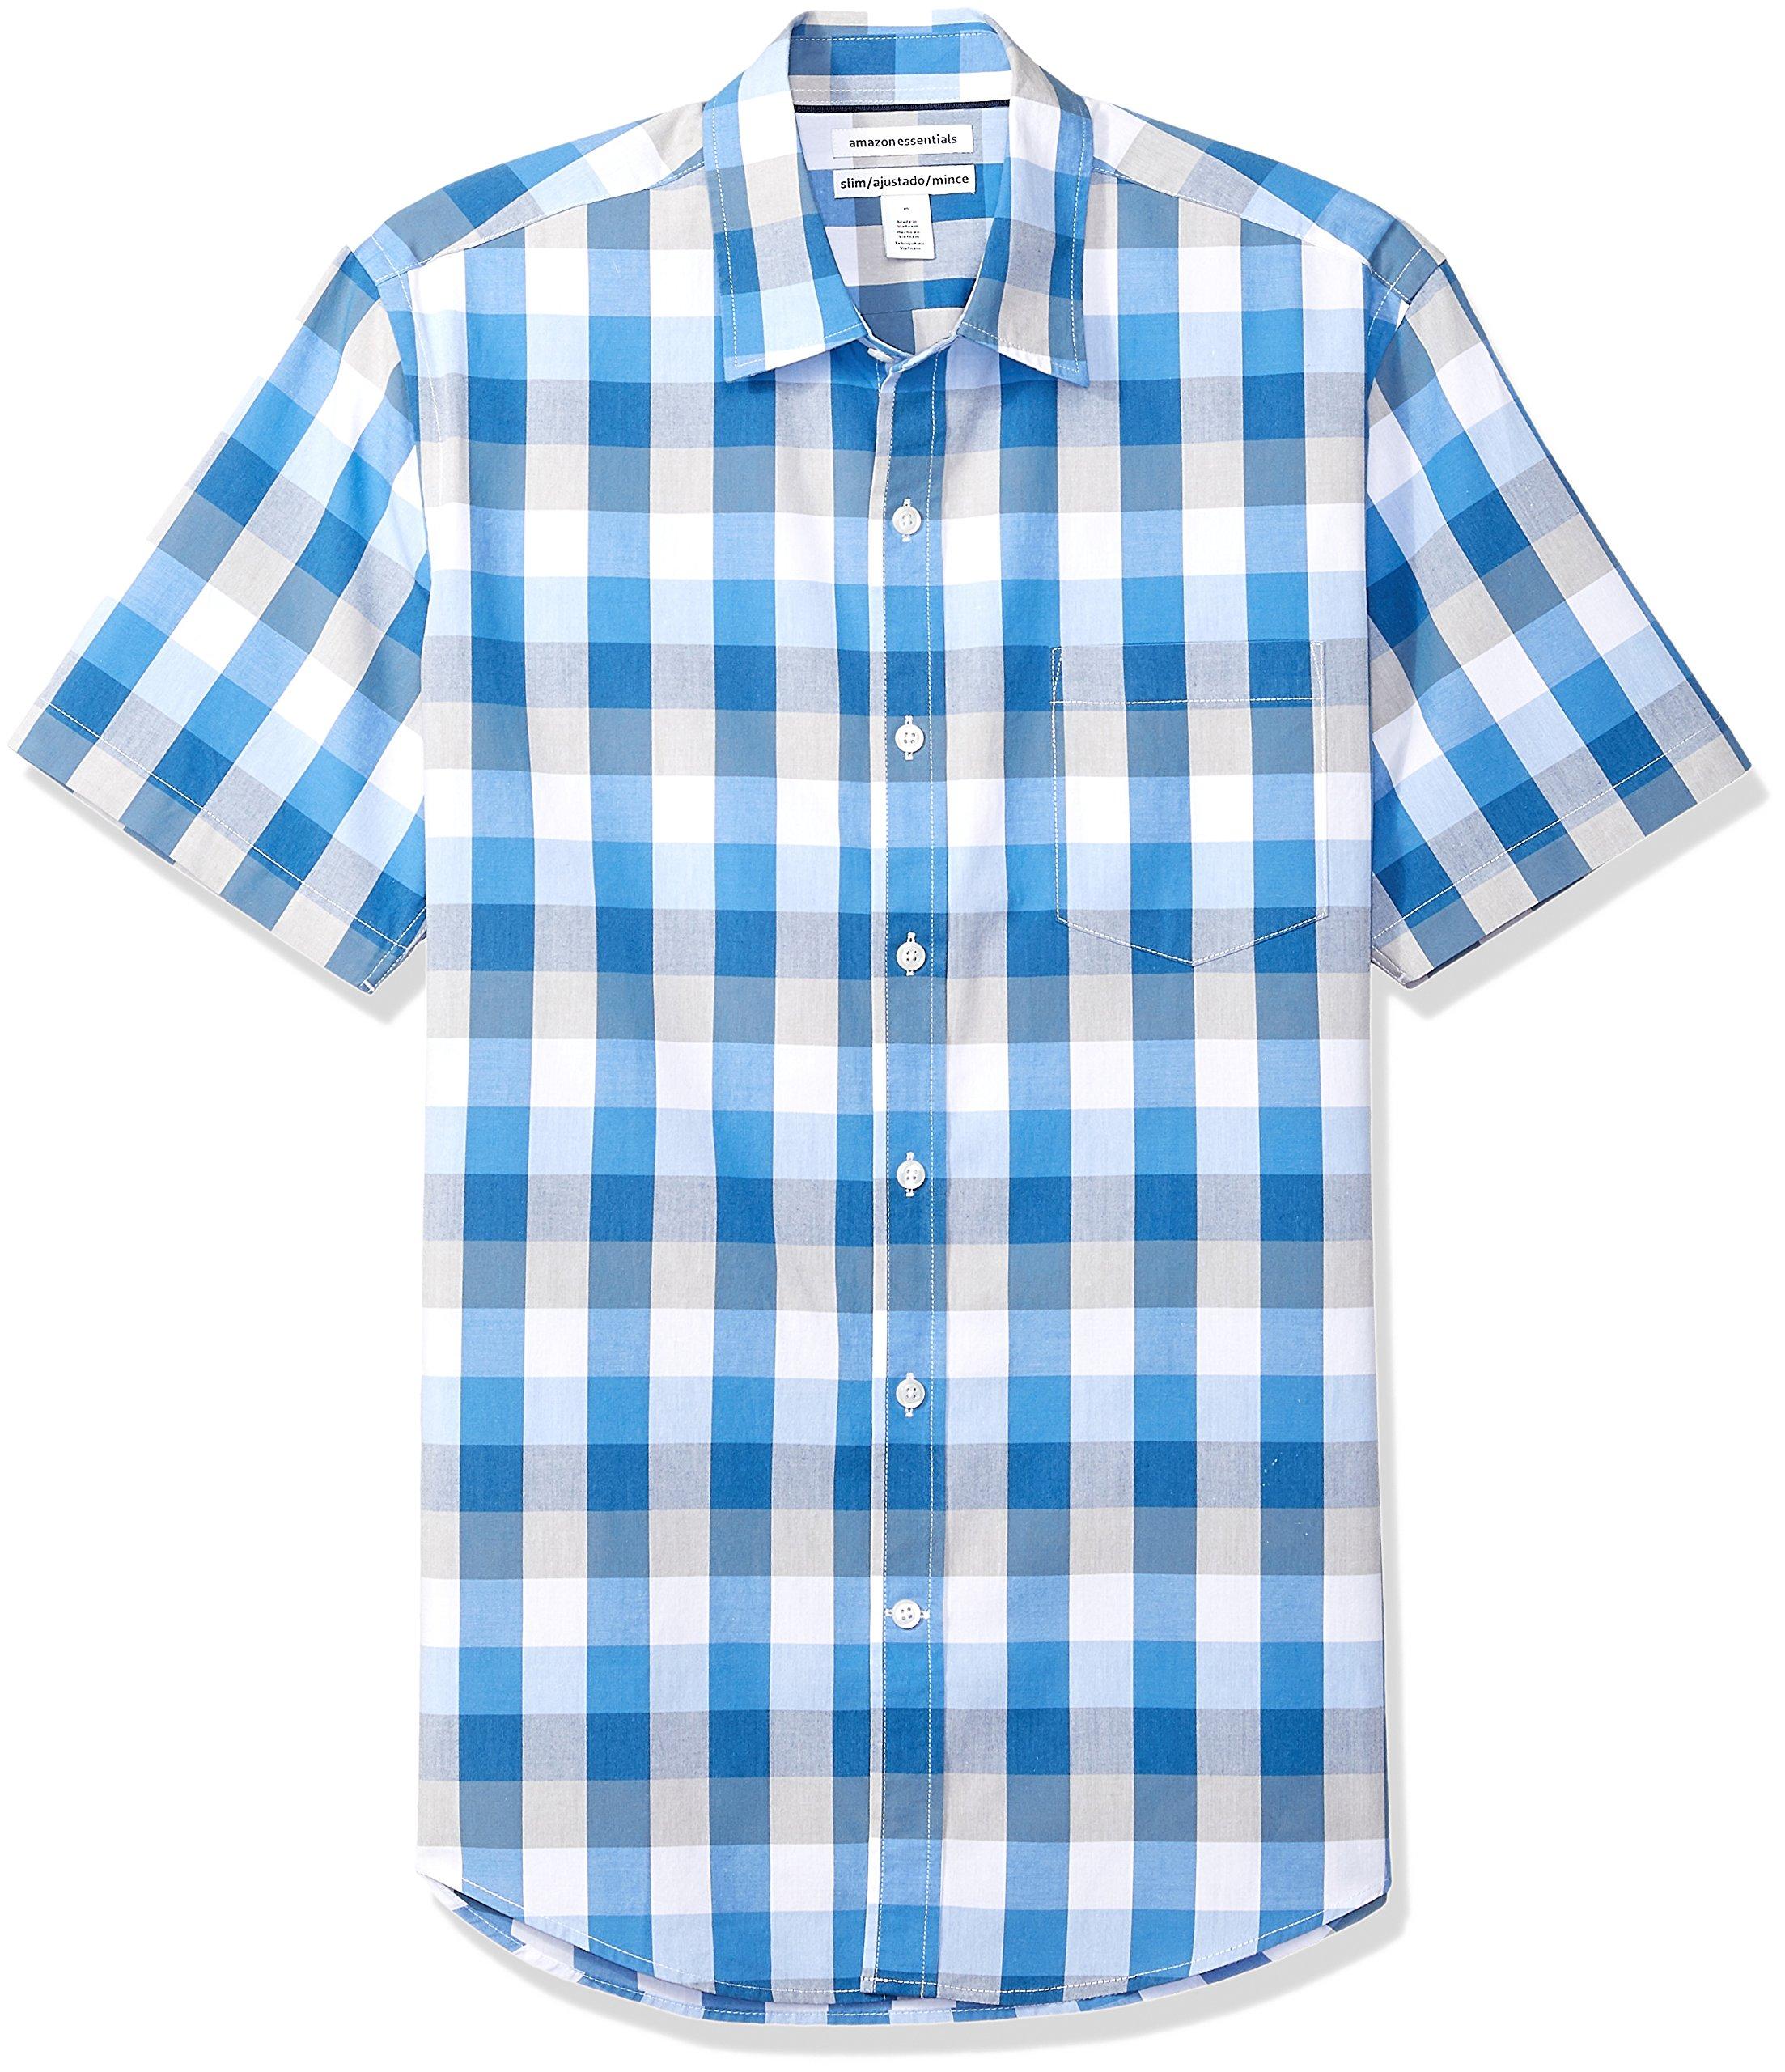 Amazon Essentials Men's Slim-Fit Short-Sleeve Casual Poplin Shirt, Blue/Grey Check, Large by Amazon Essentials